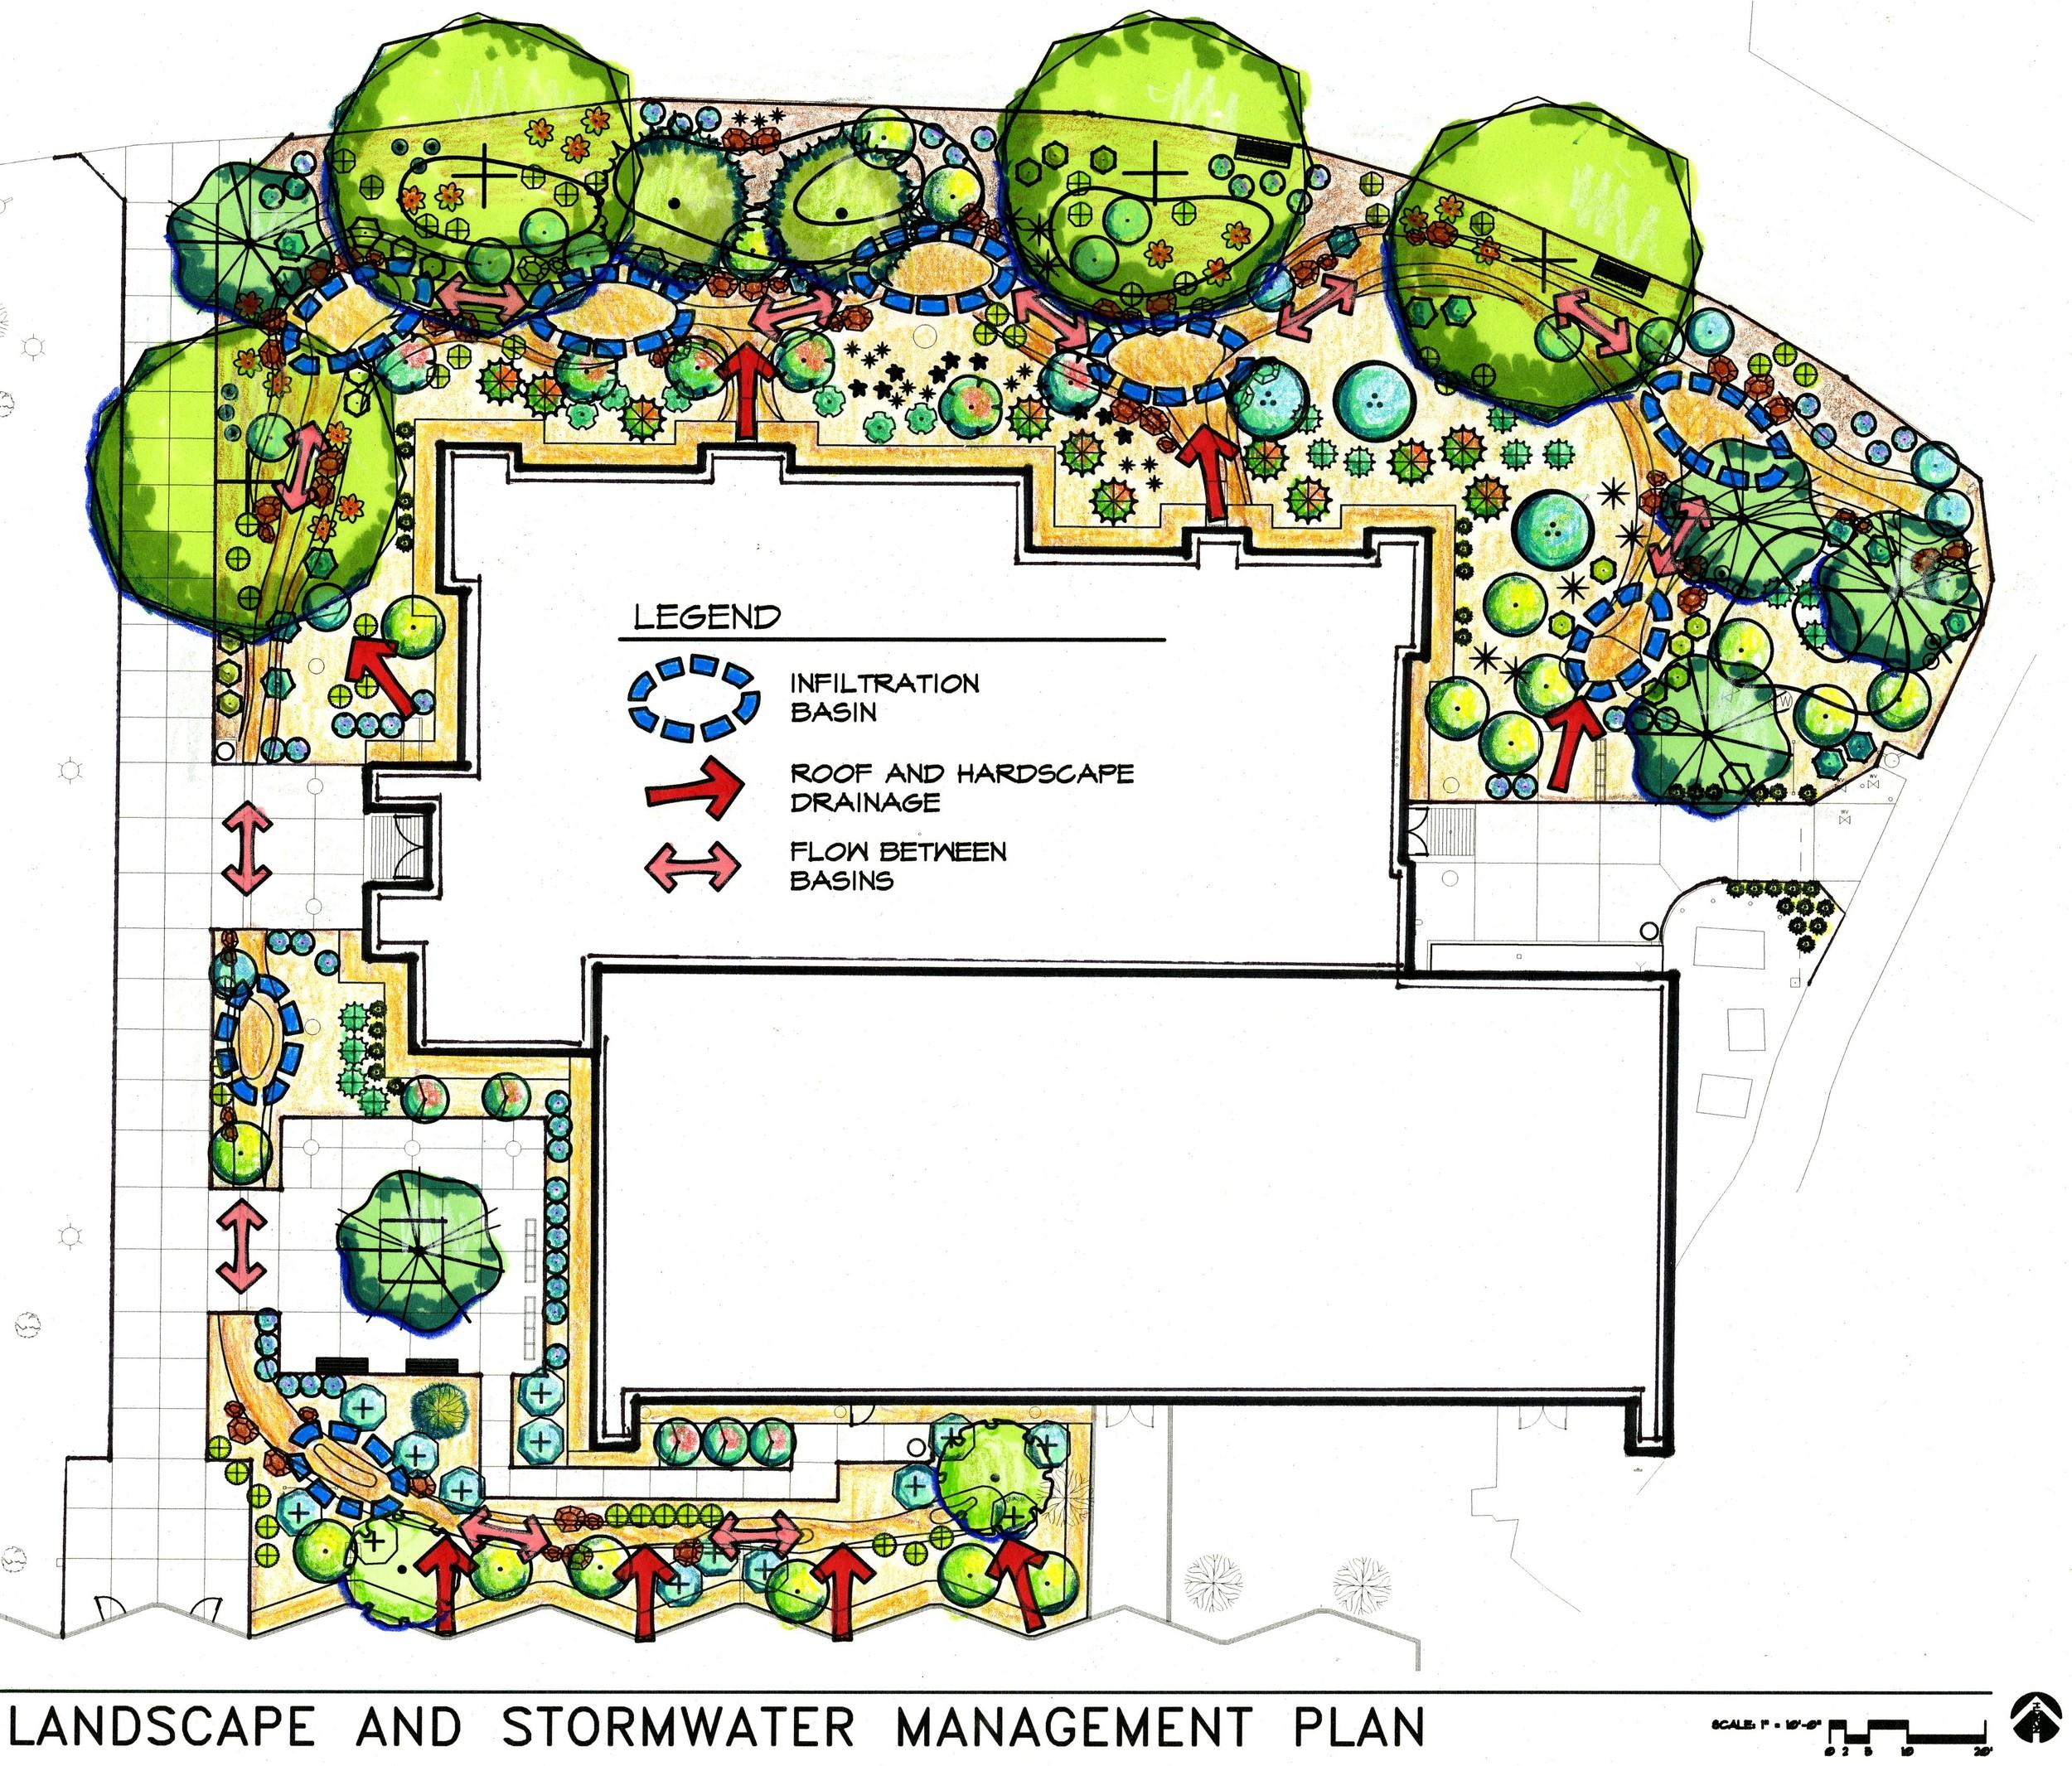 Stormwater management sketch design